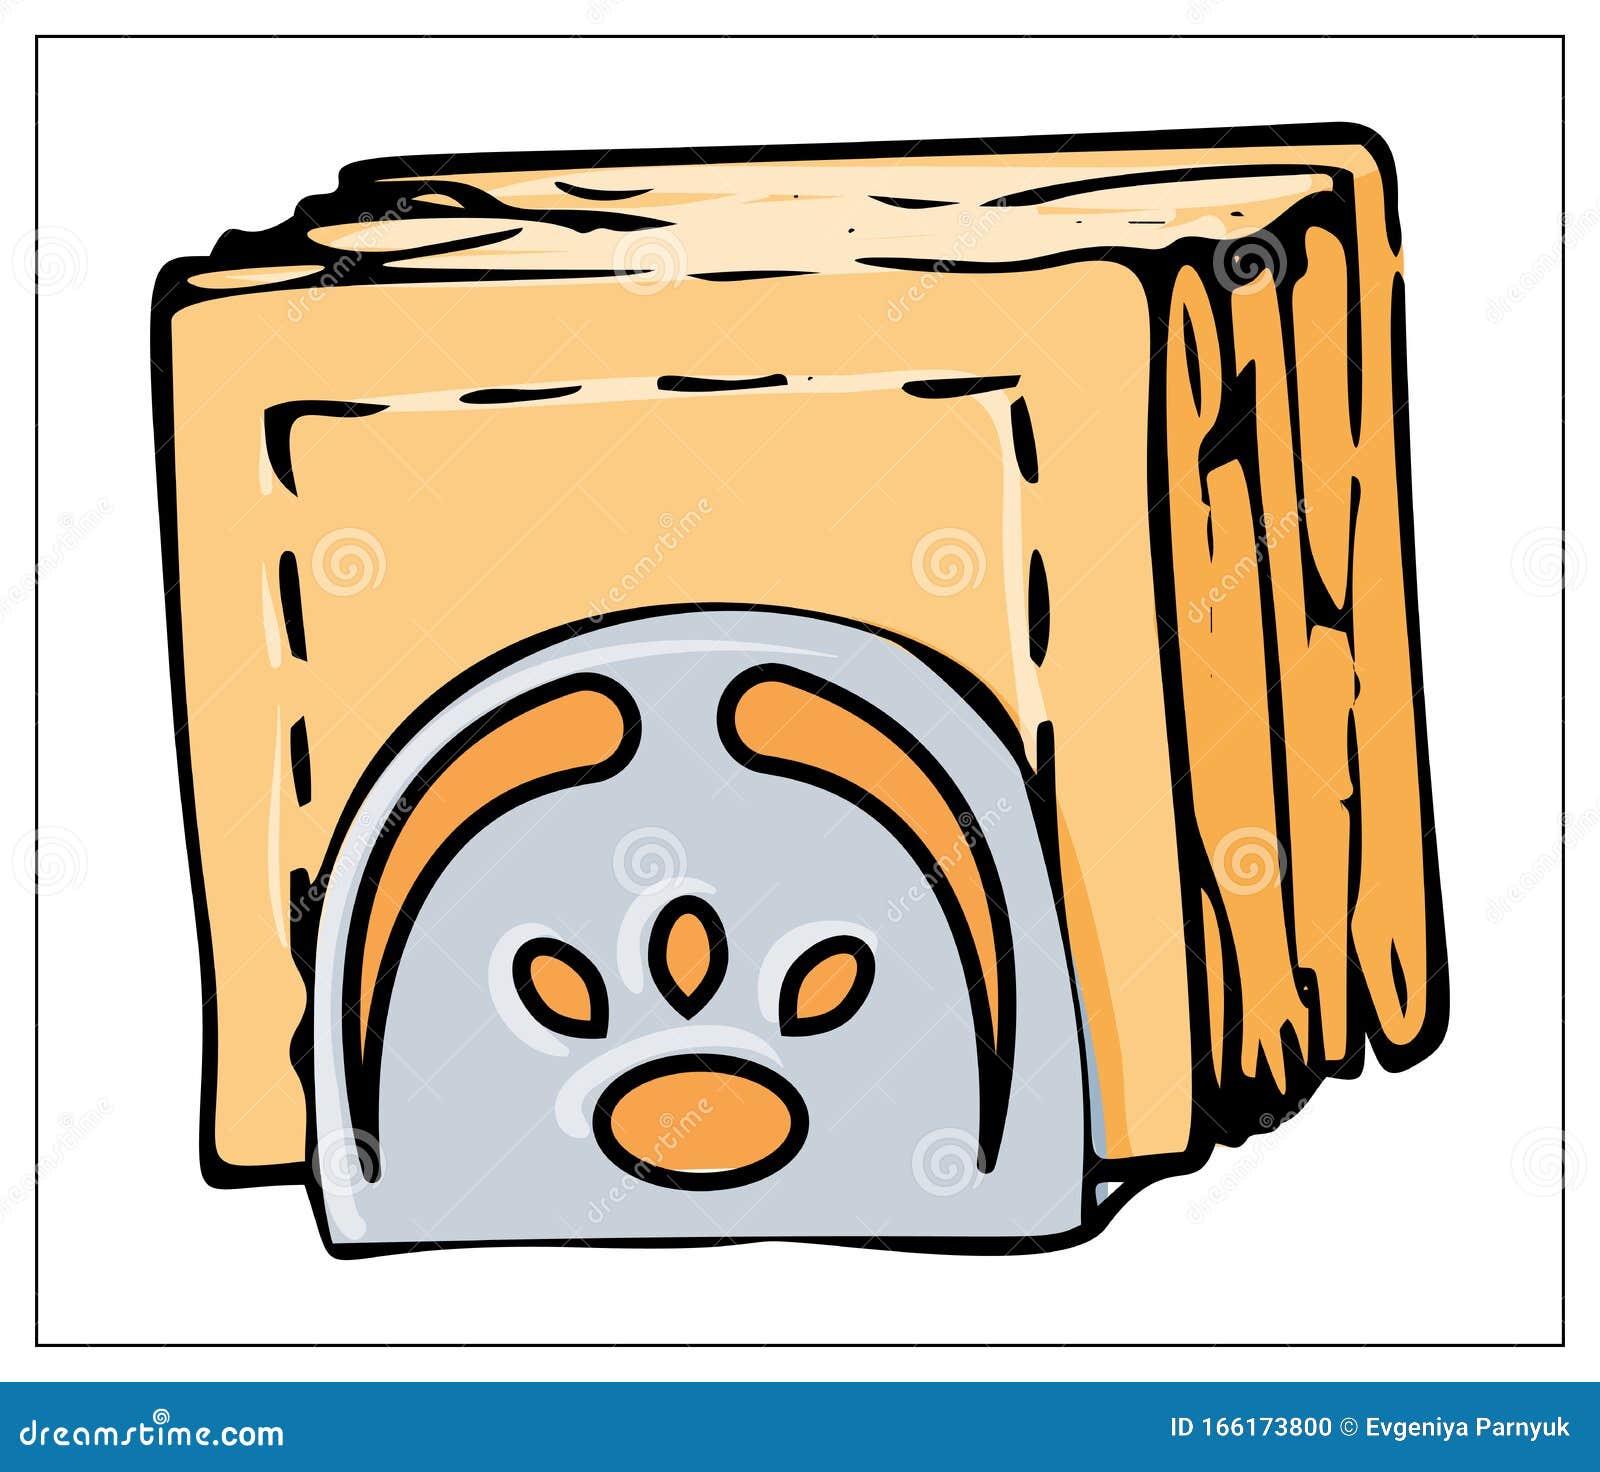 Vector Napkin Holder Isolated On A White Background Stock Vector Illustration Of Element Design 166173800